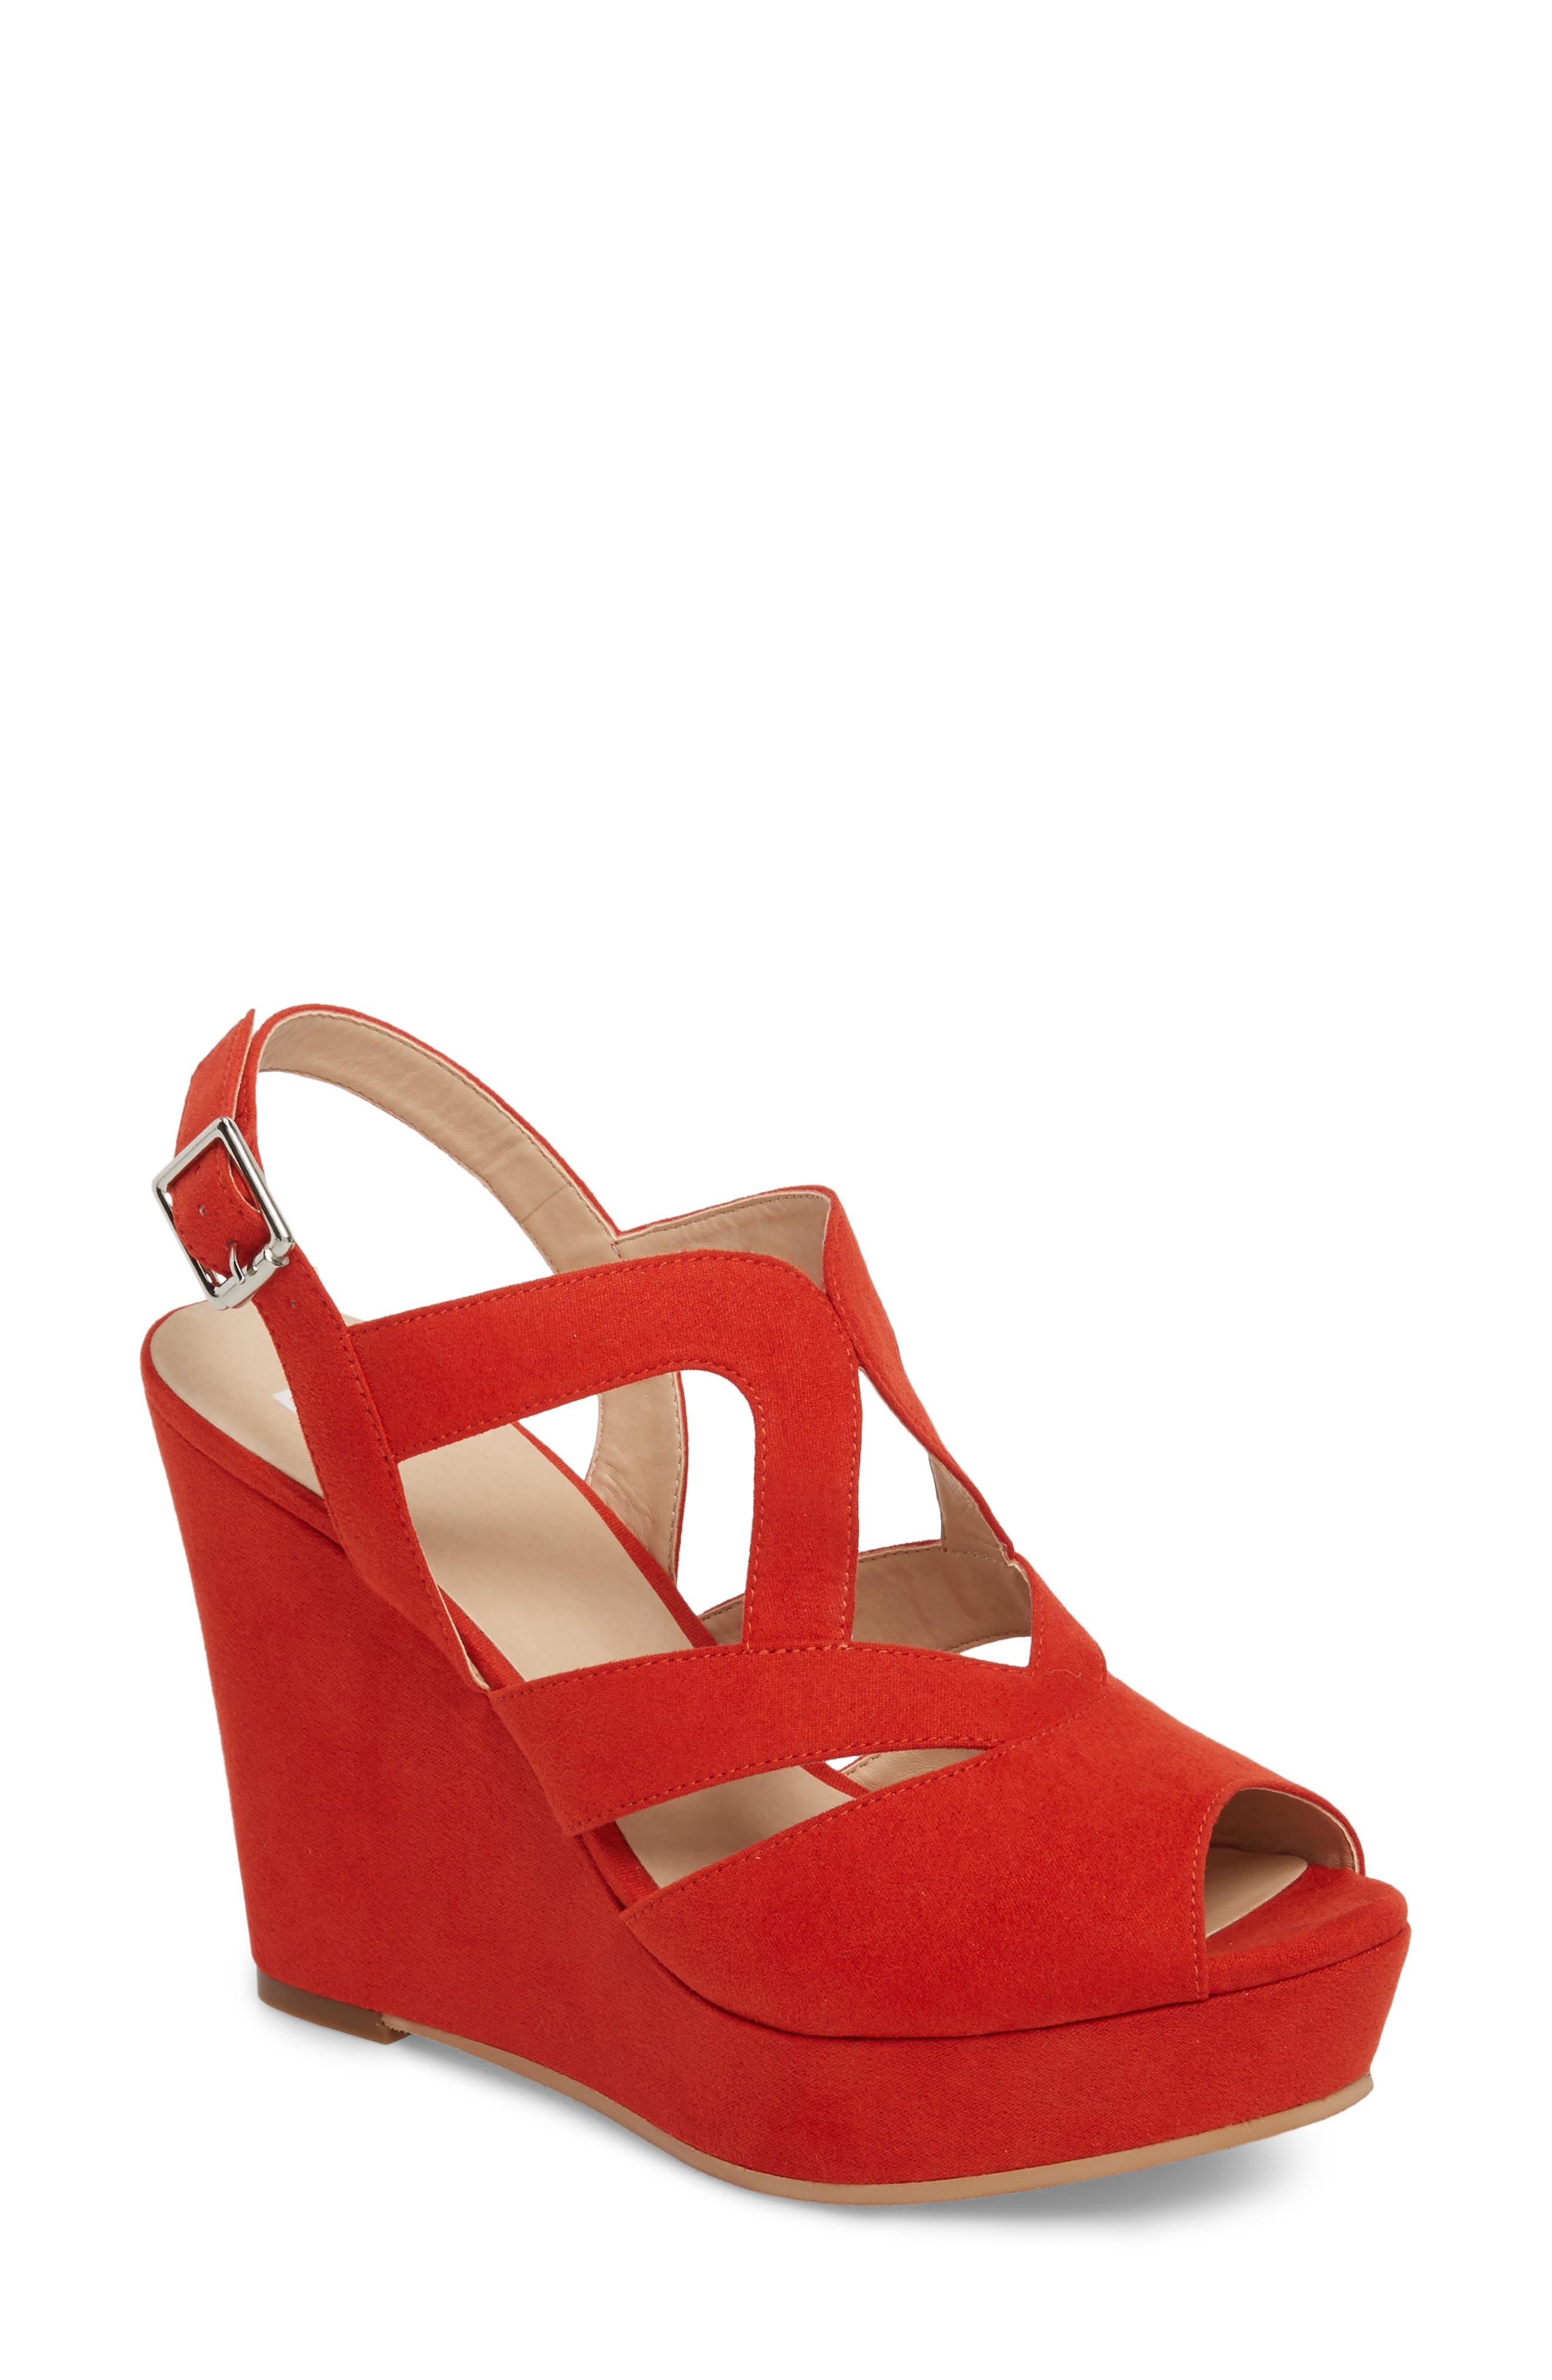 Sunny Platform Wedge Sandal,                             Main thumbnail 6, color,